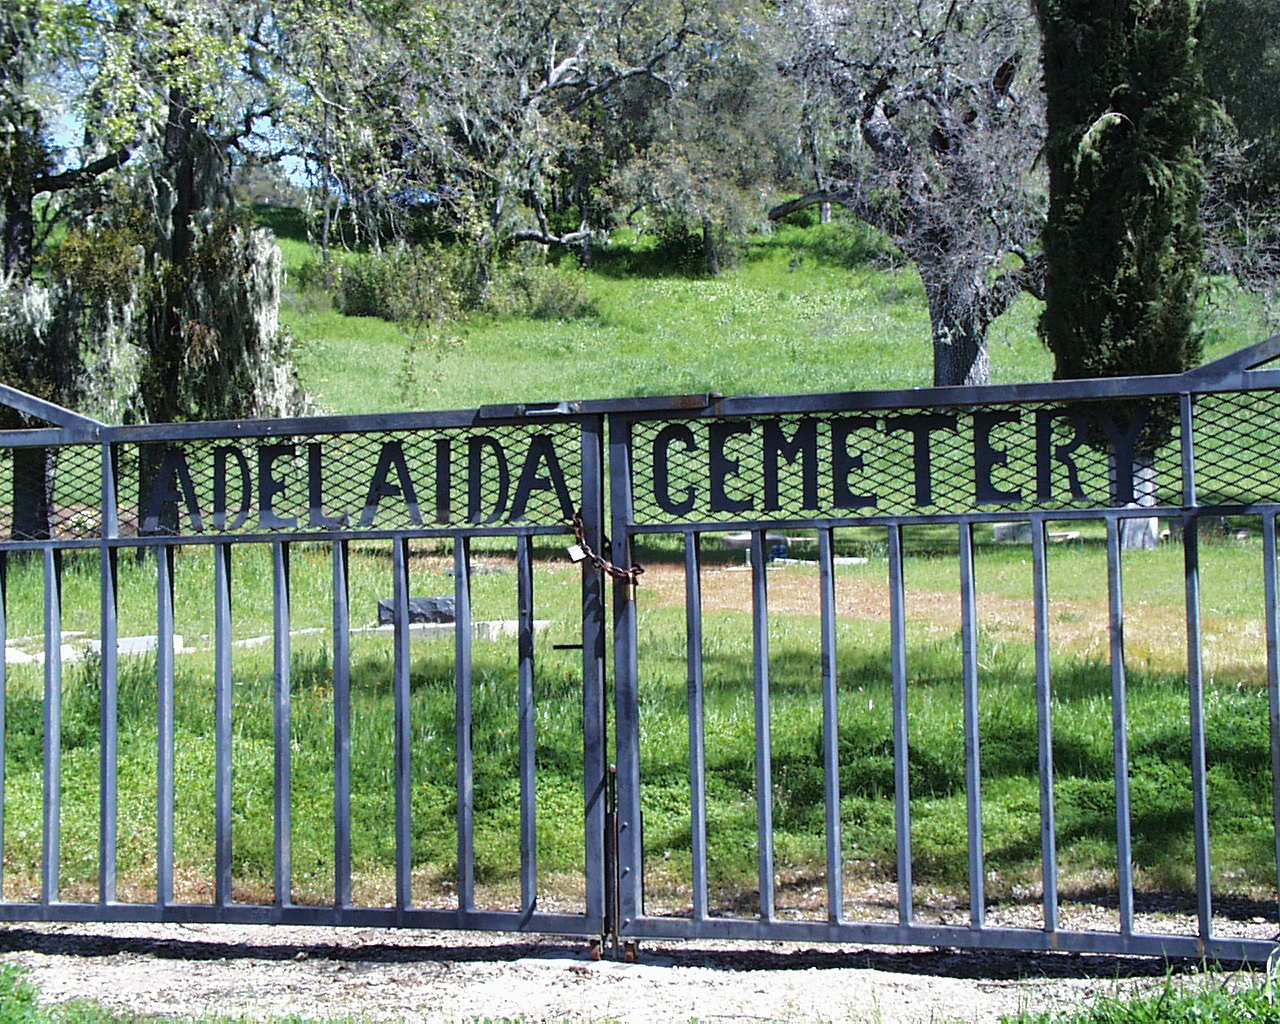 Adelaida Cemetery in Paso Robles, California